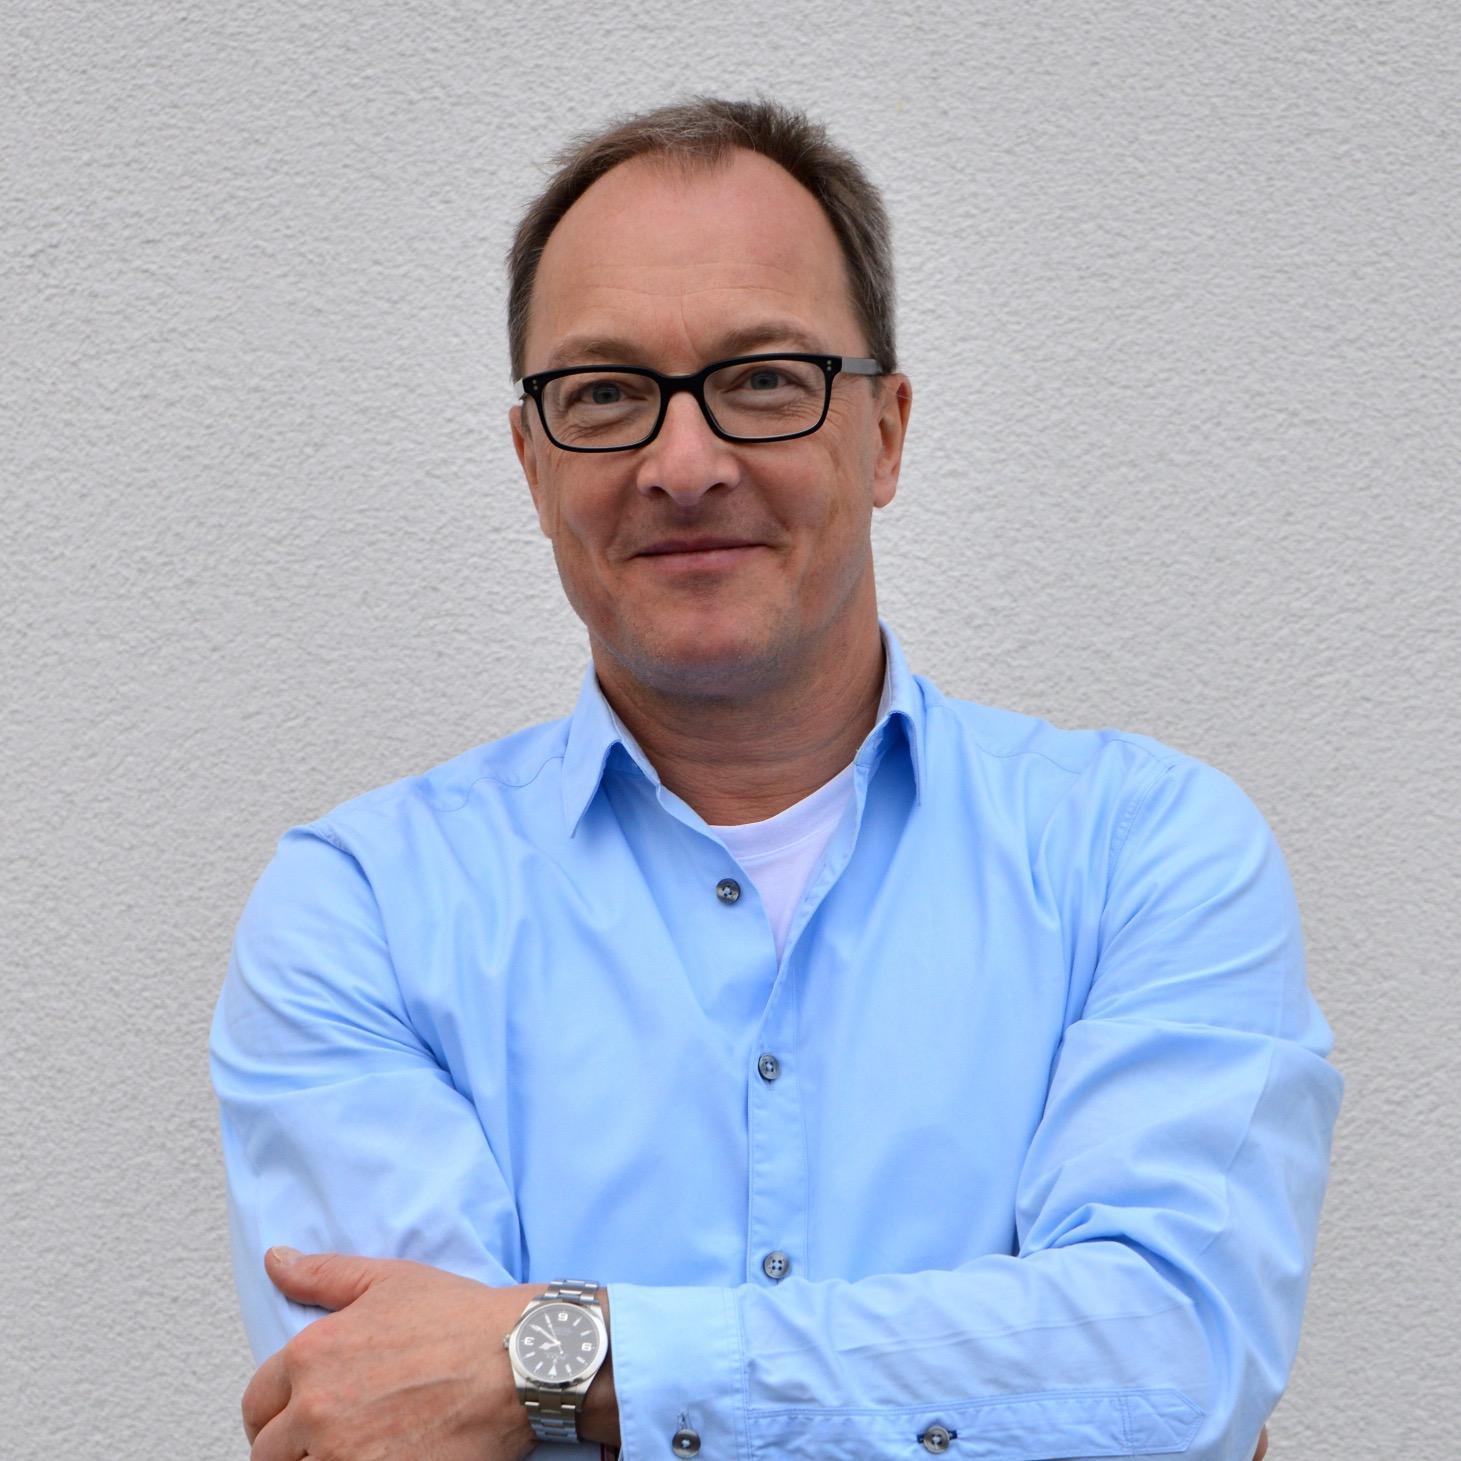 Dr. Stefan Schraag